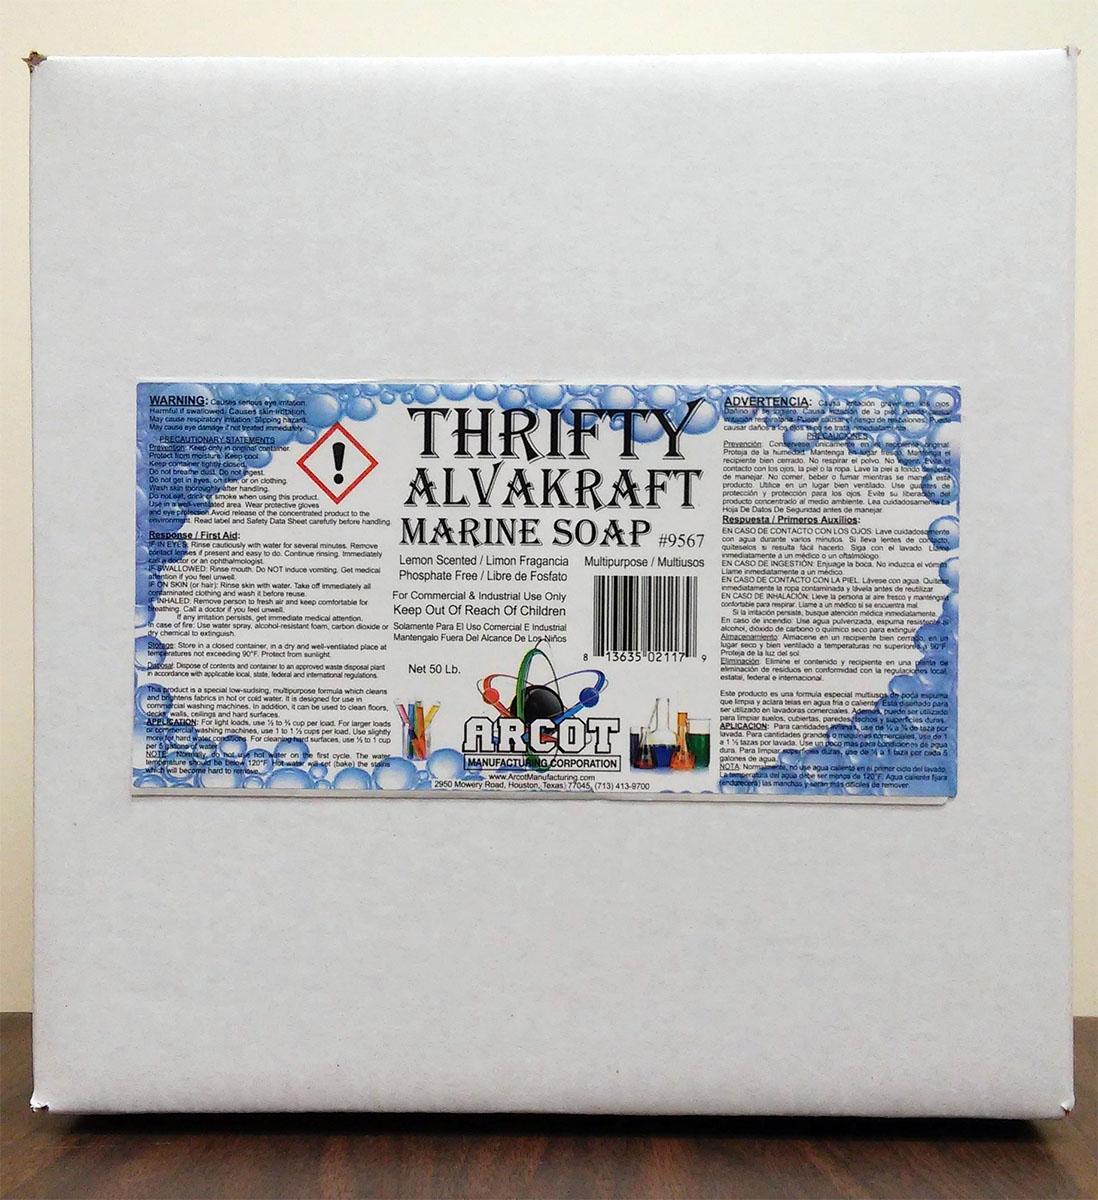 Thrifty Alvakraft